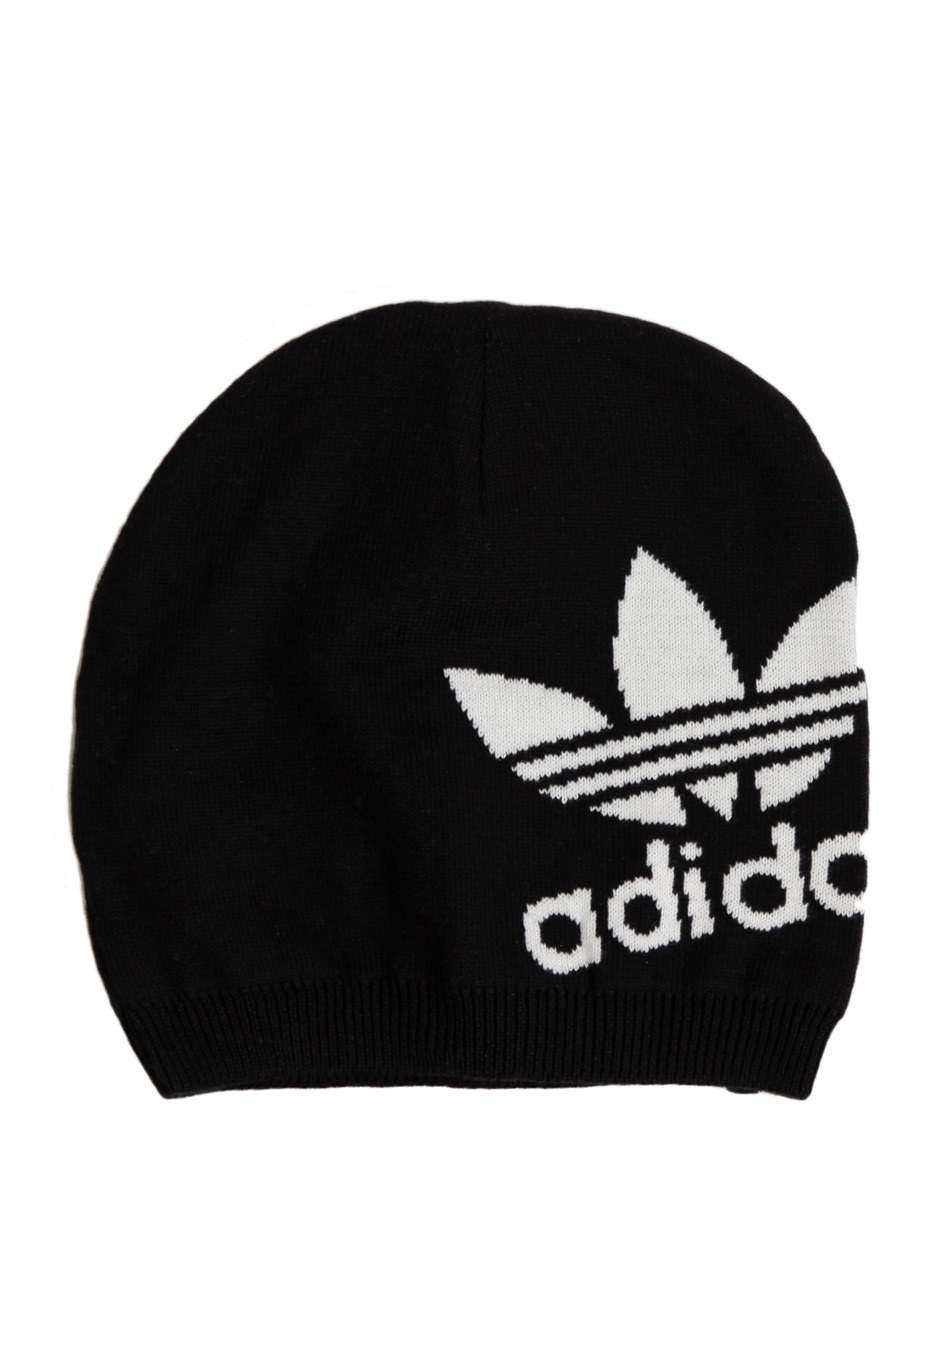 Adidas - Adicolor Reversible Black Running White - Beanie - Streetwear Shop  - Impericon.com AU f4da2a5780c3